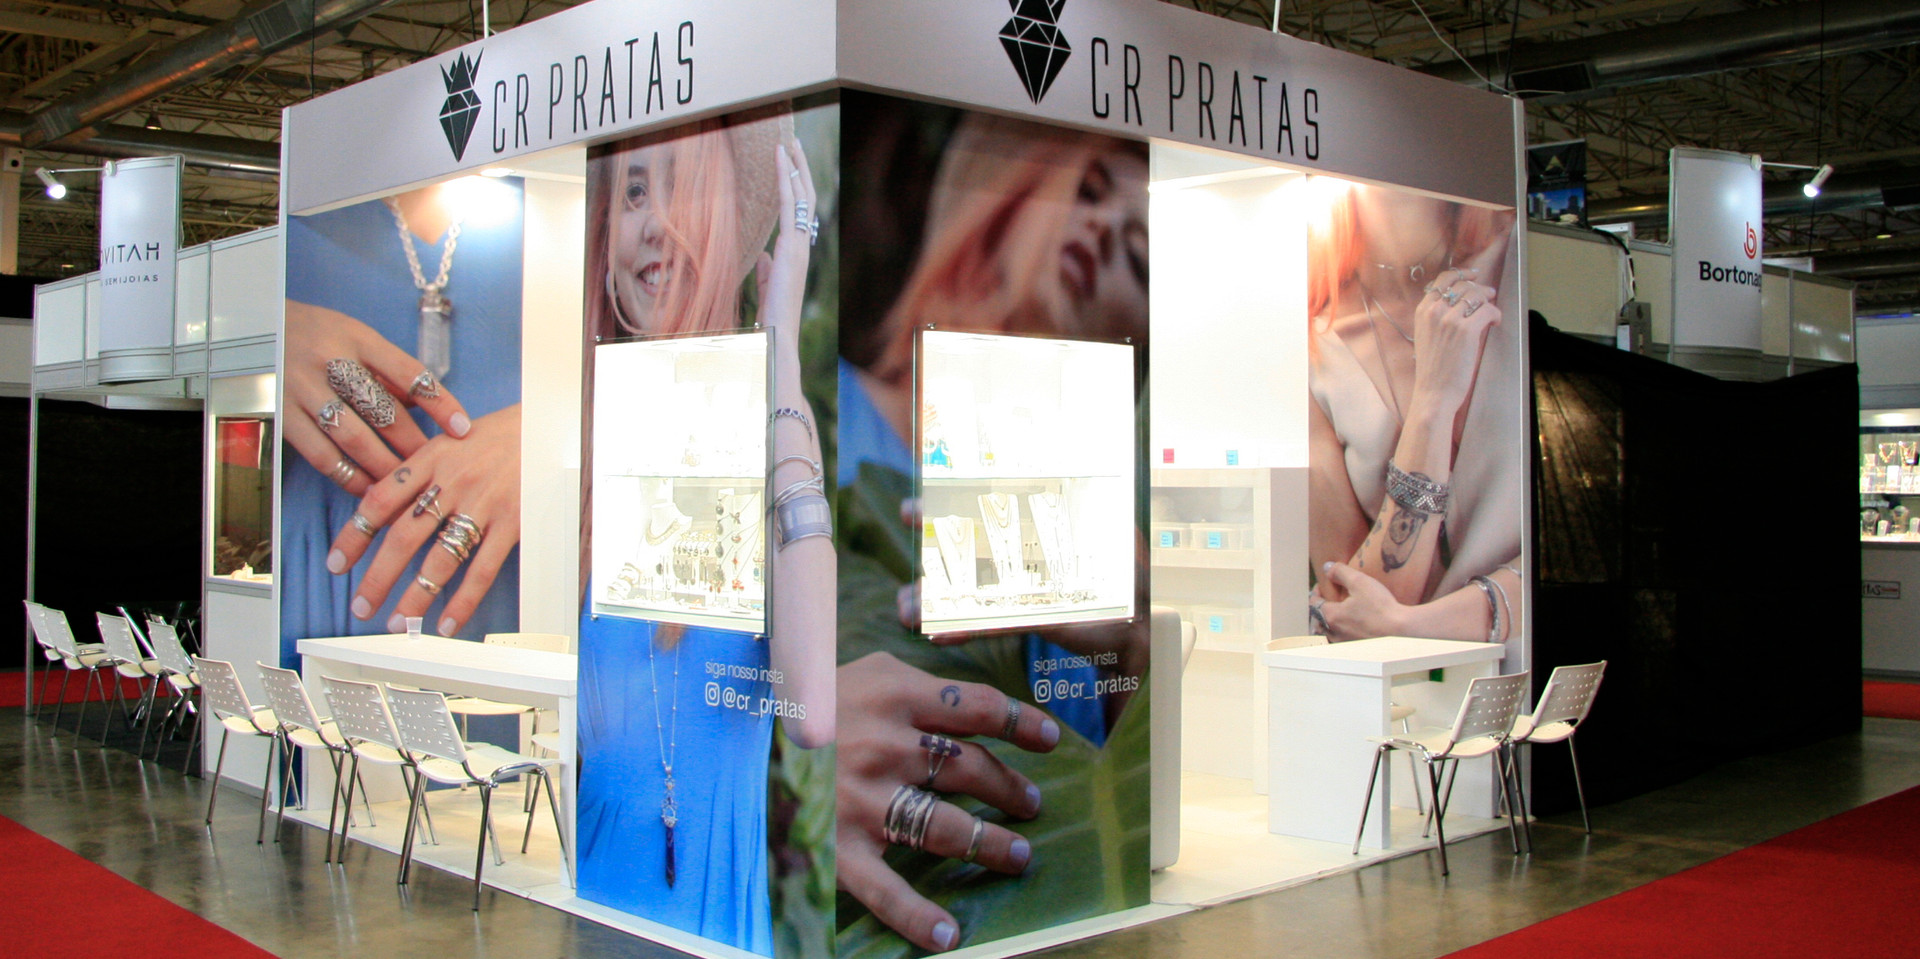 CR Pratas (6).JPG